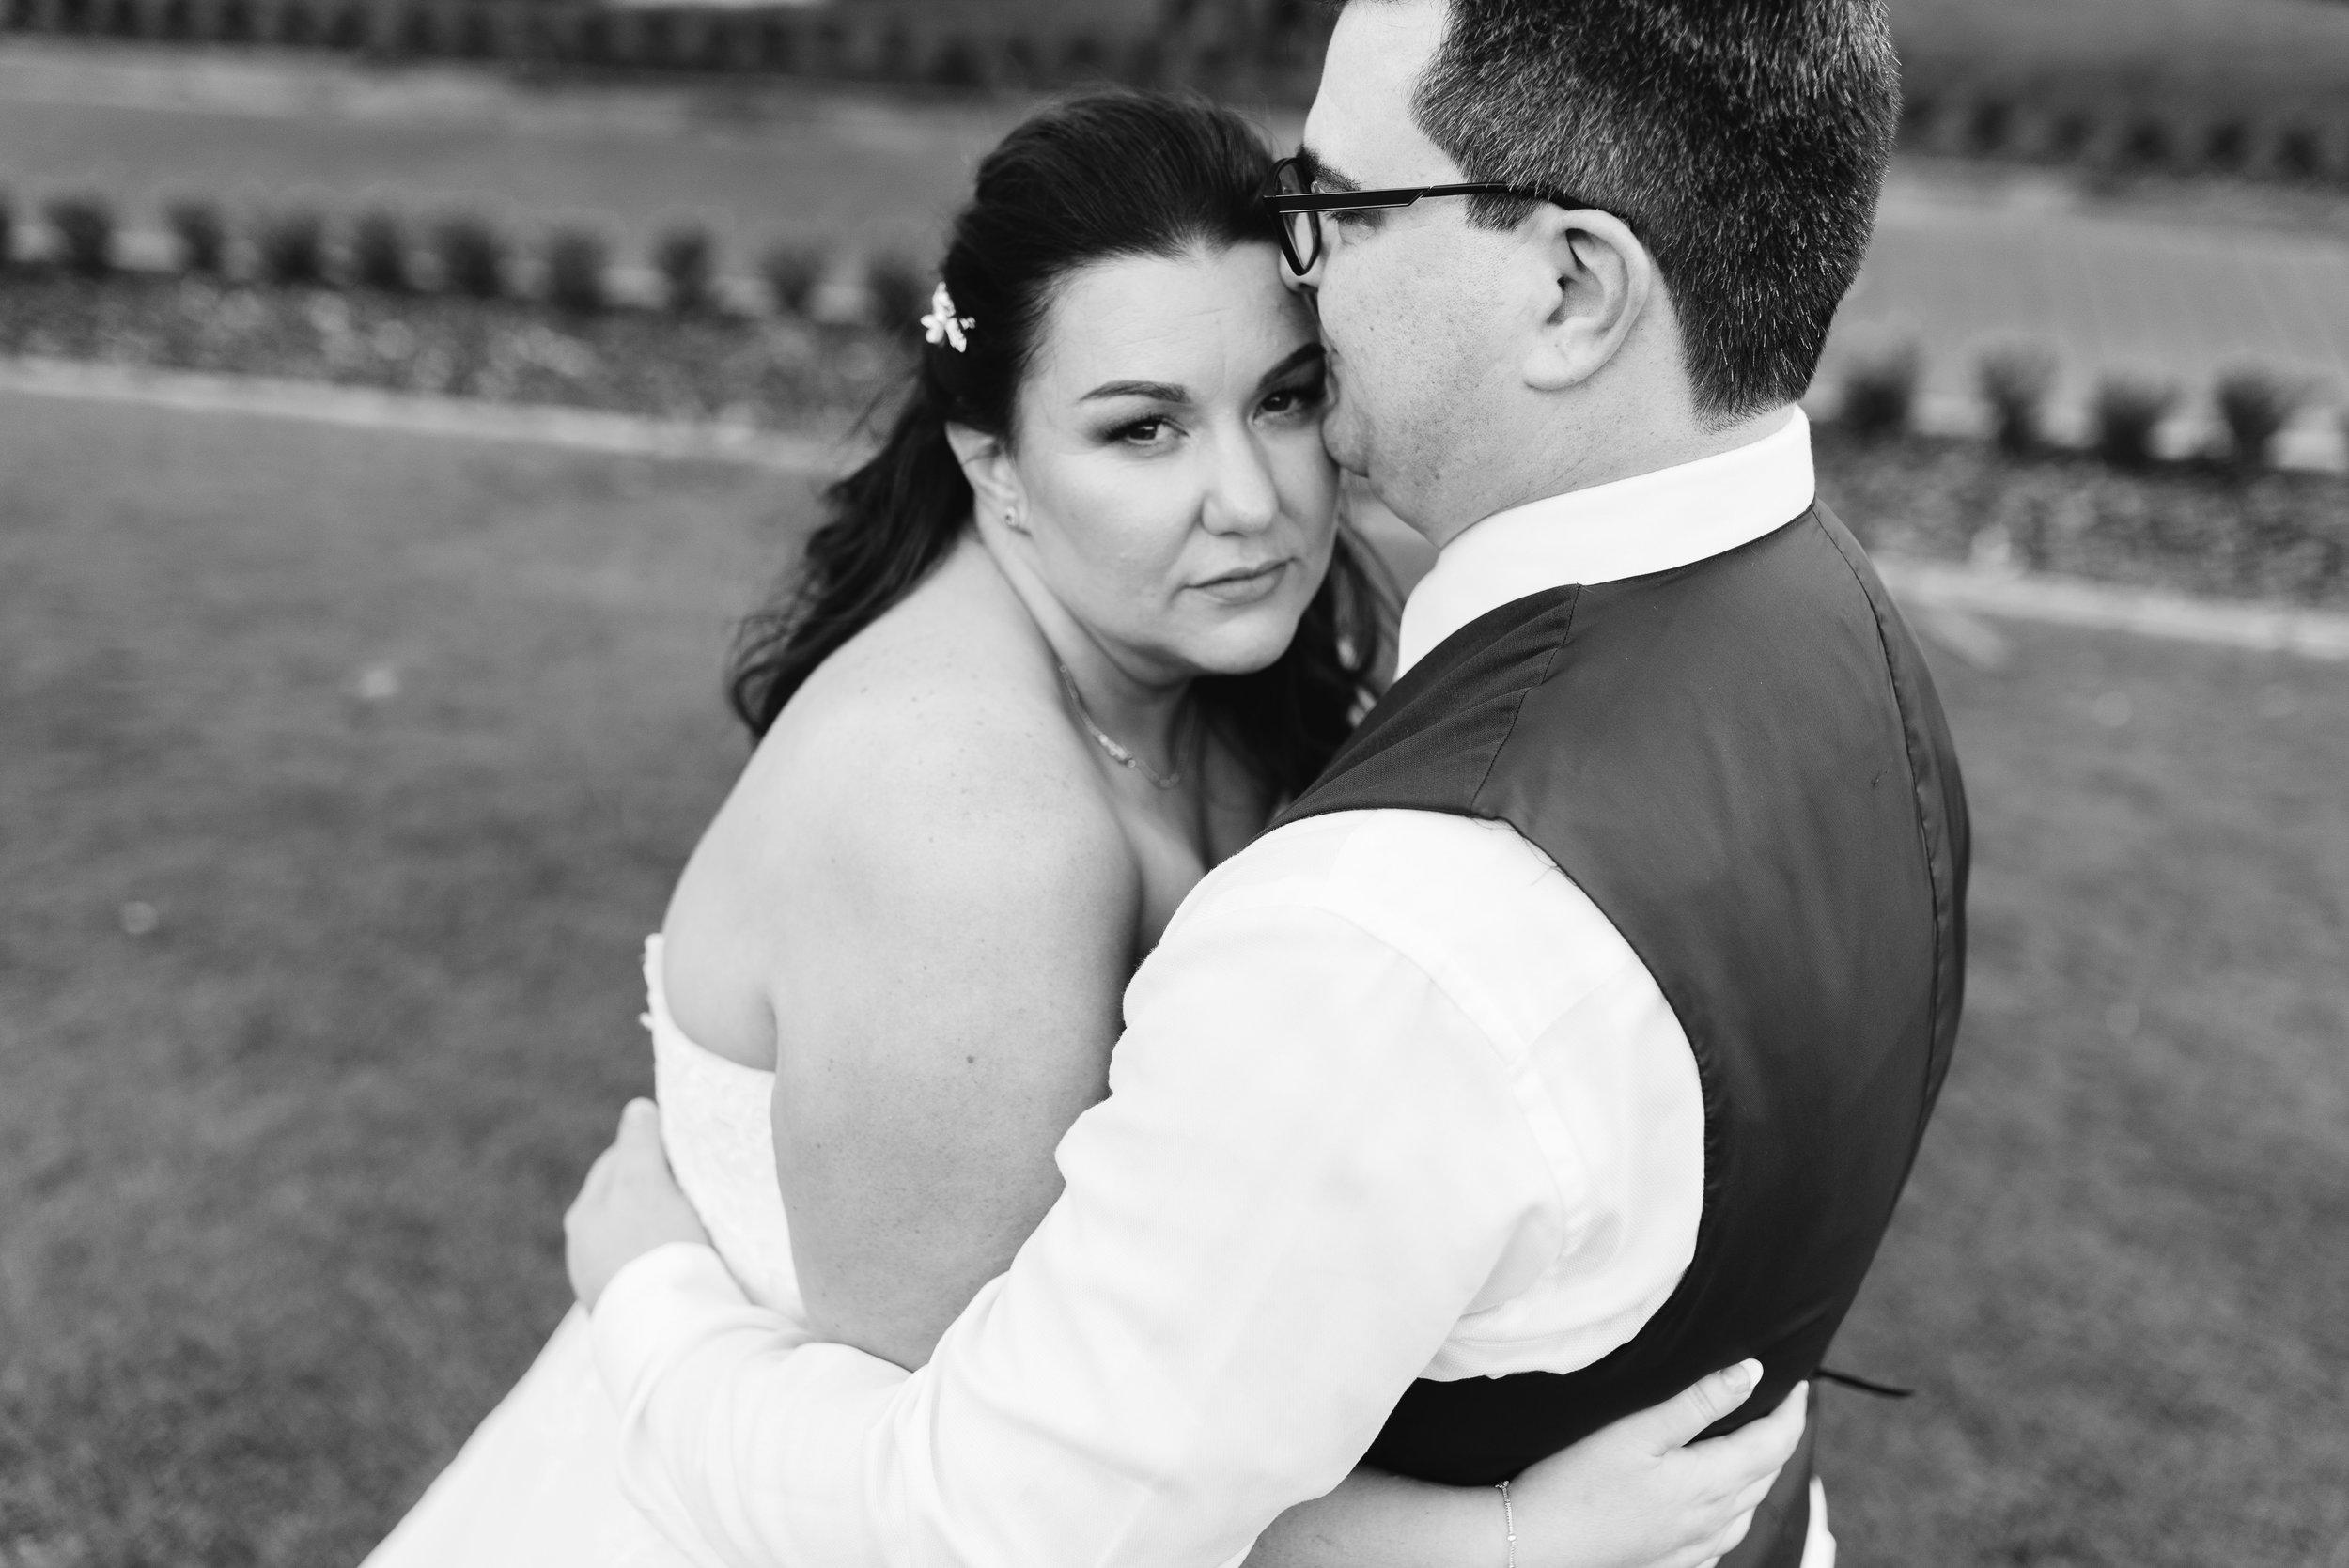 brisbane-wedding-photographer-74.jpg